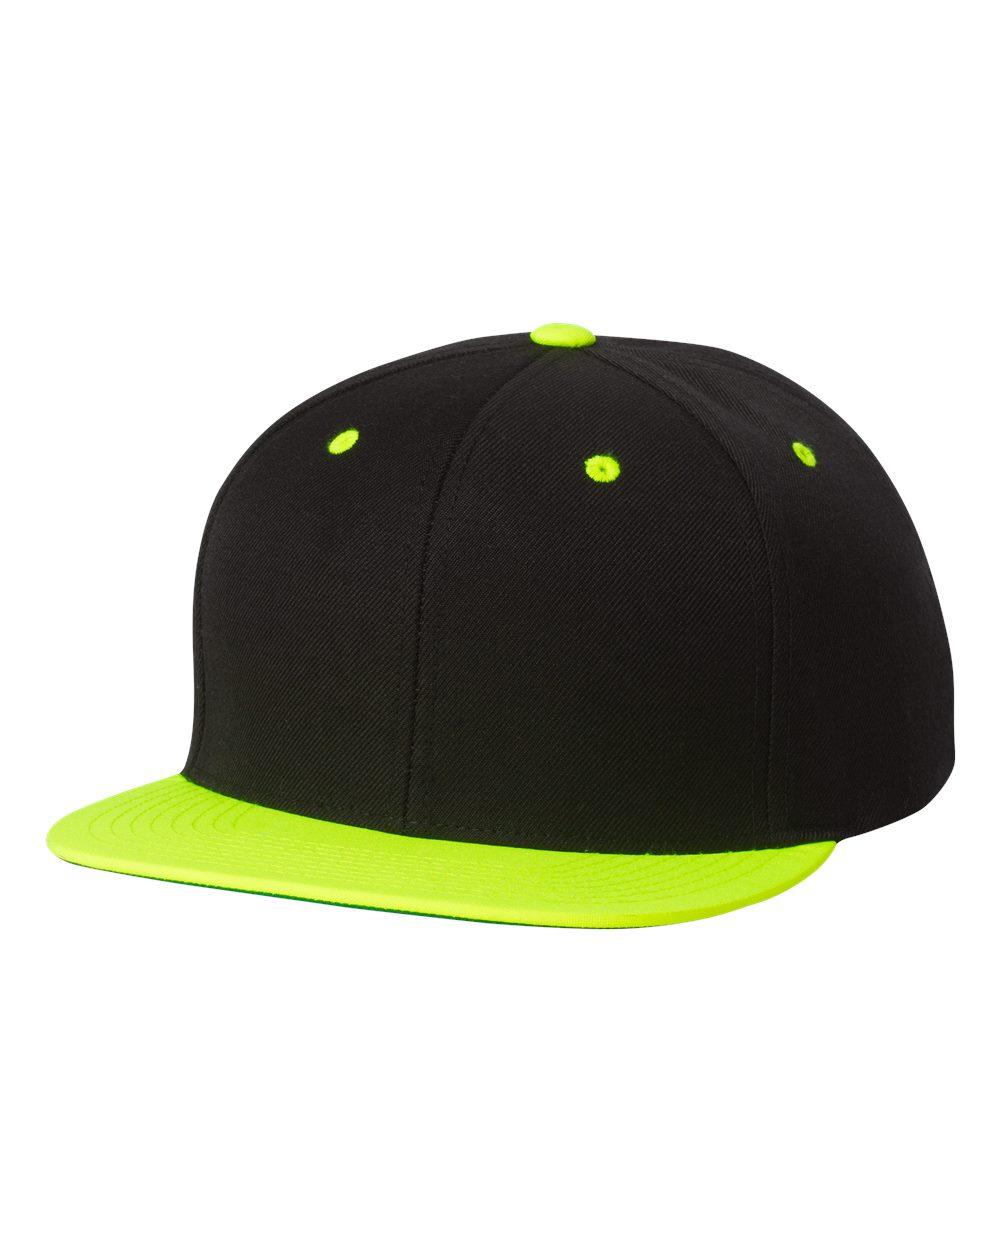 Black-Neon Green.jpg